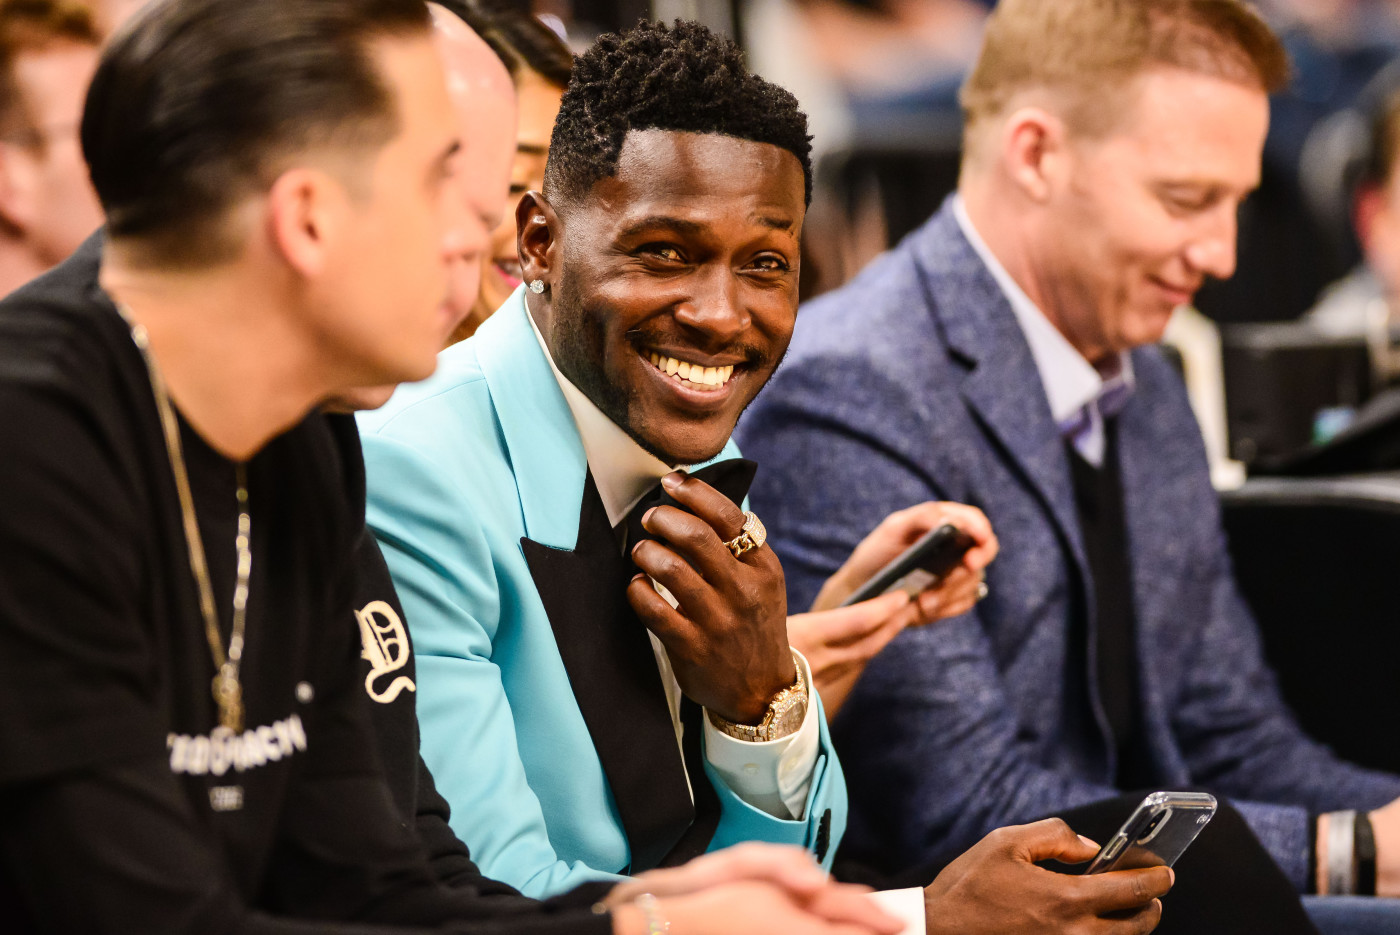 Antonio Brown Courtside Pelicans Wolves 2018